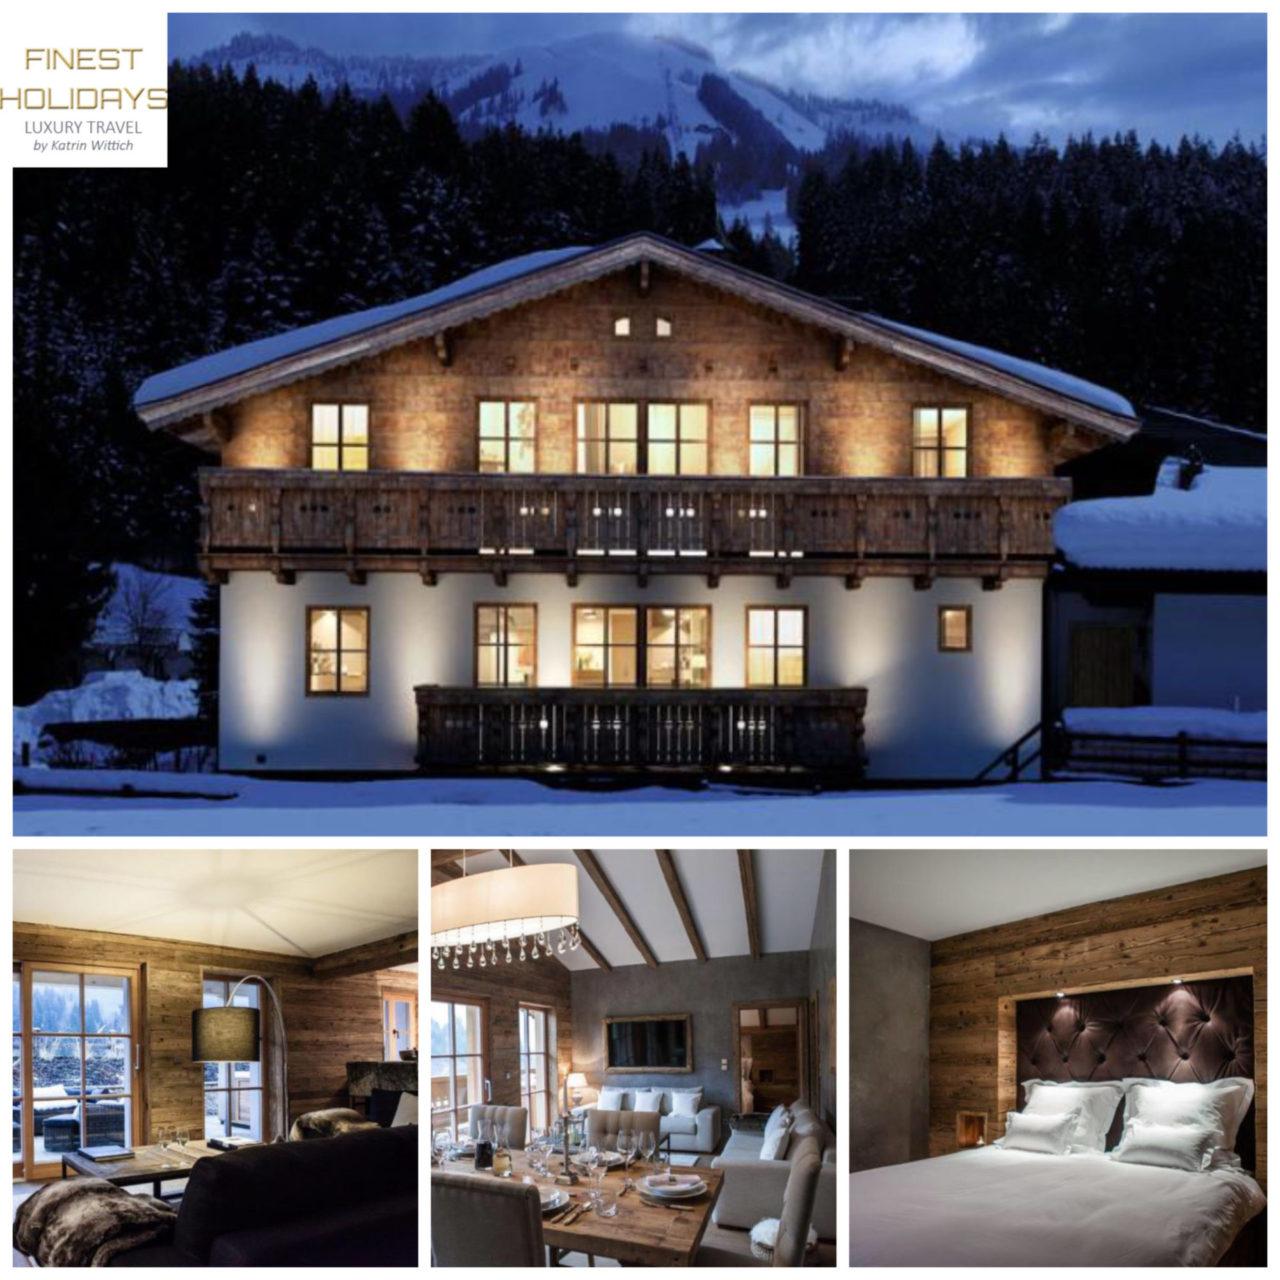 www.finest-holidays.com Austrian Alps, Kitzbuehel, Kitzbühel, luxury ski chalet Kitz, Austria